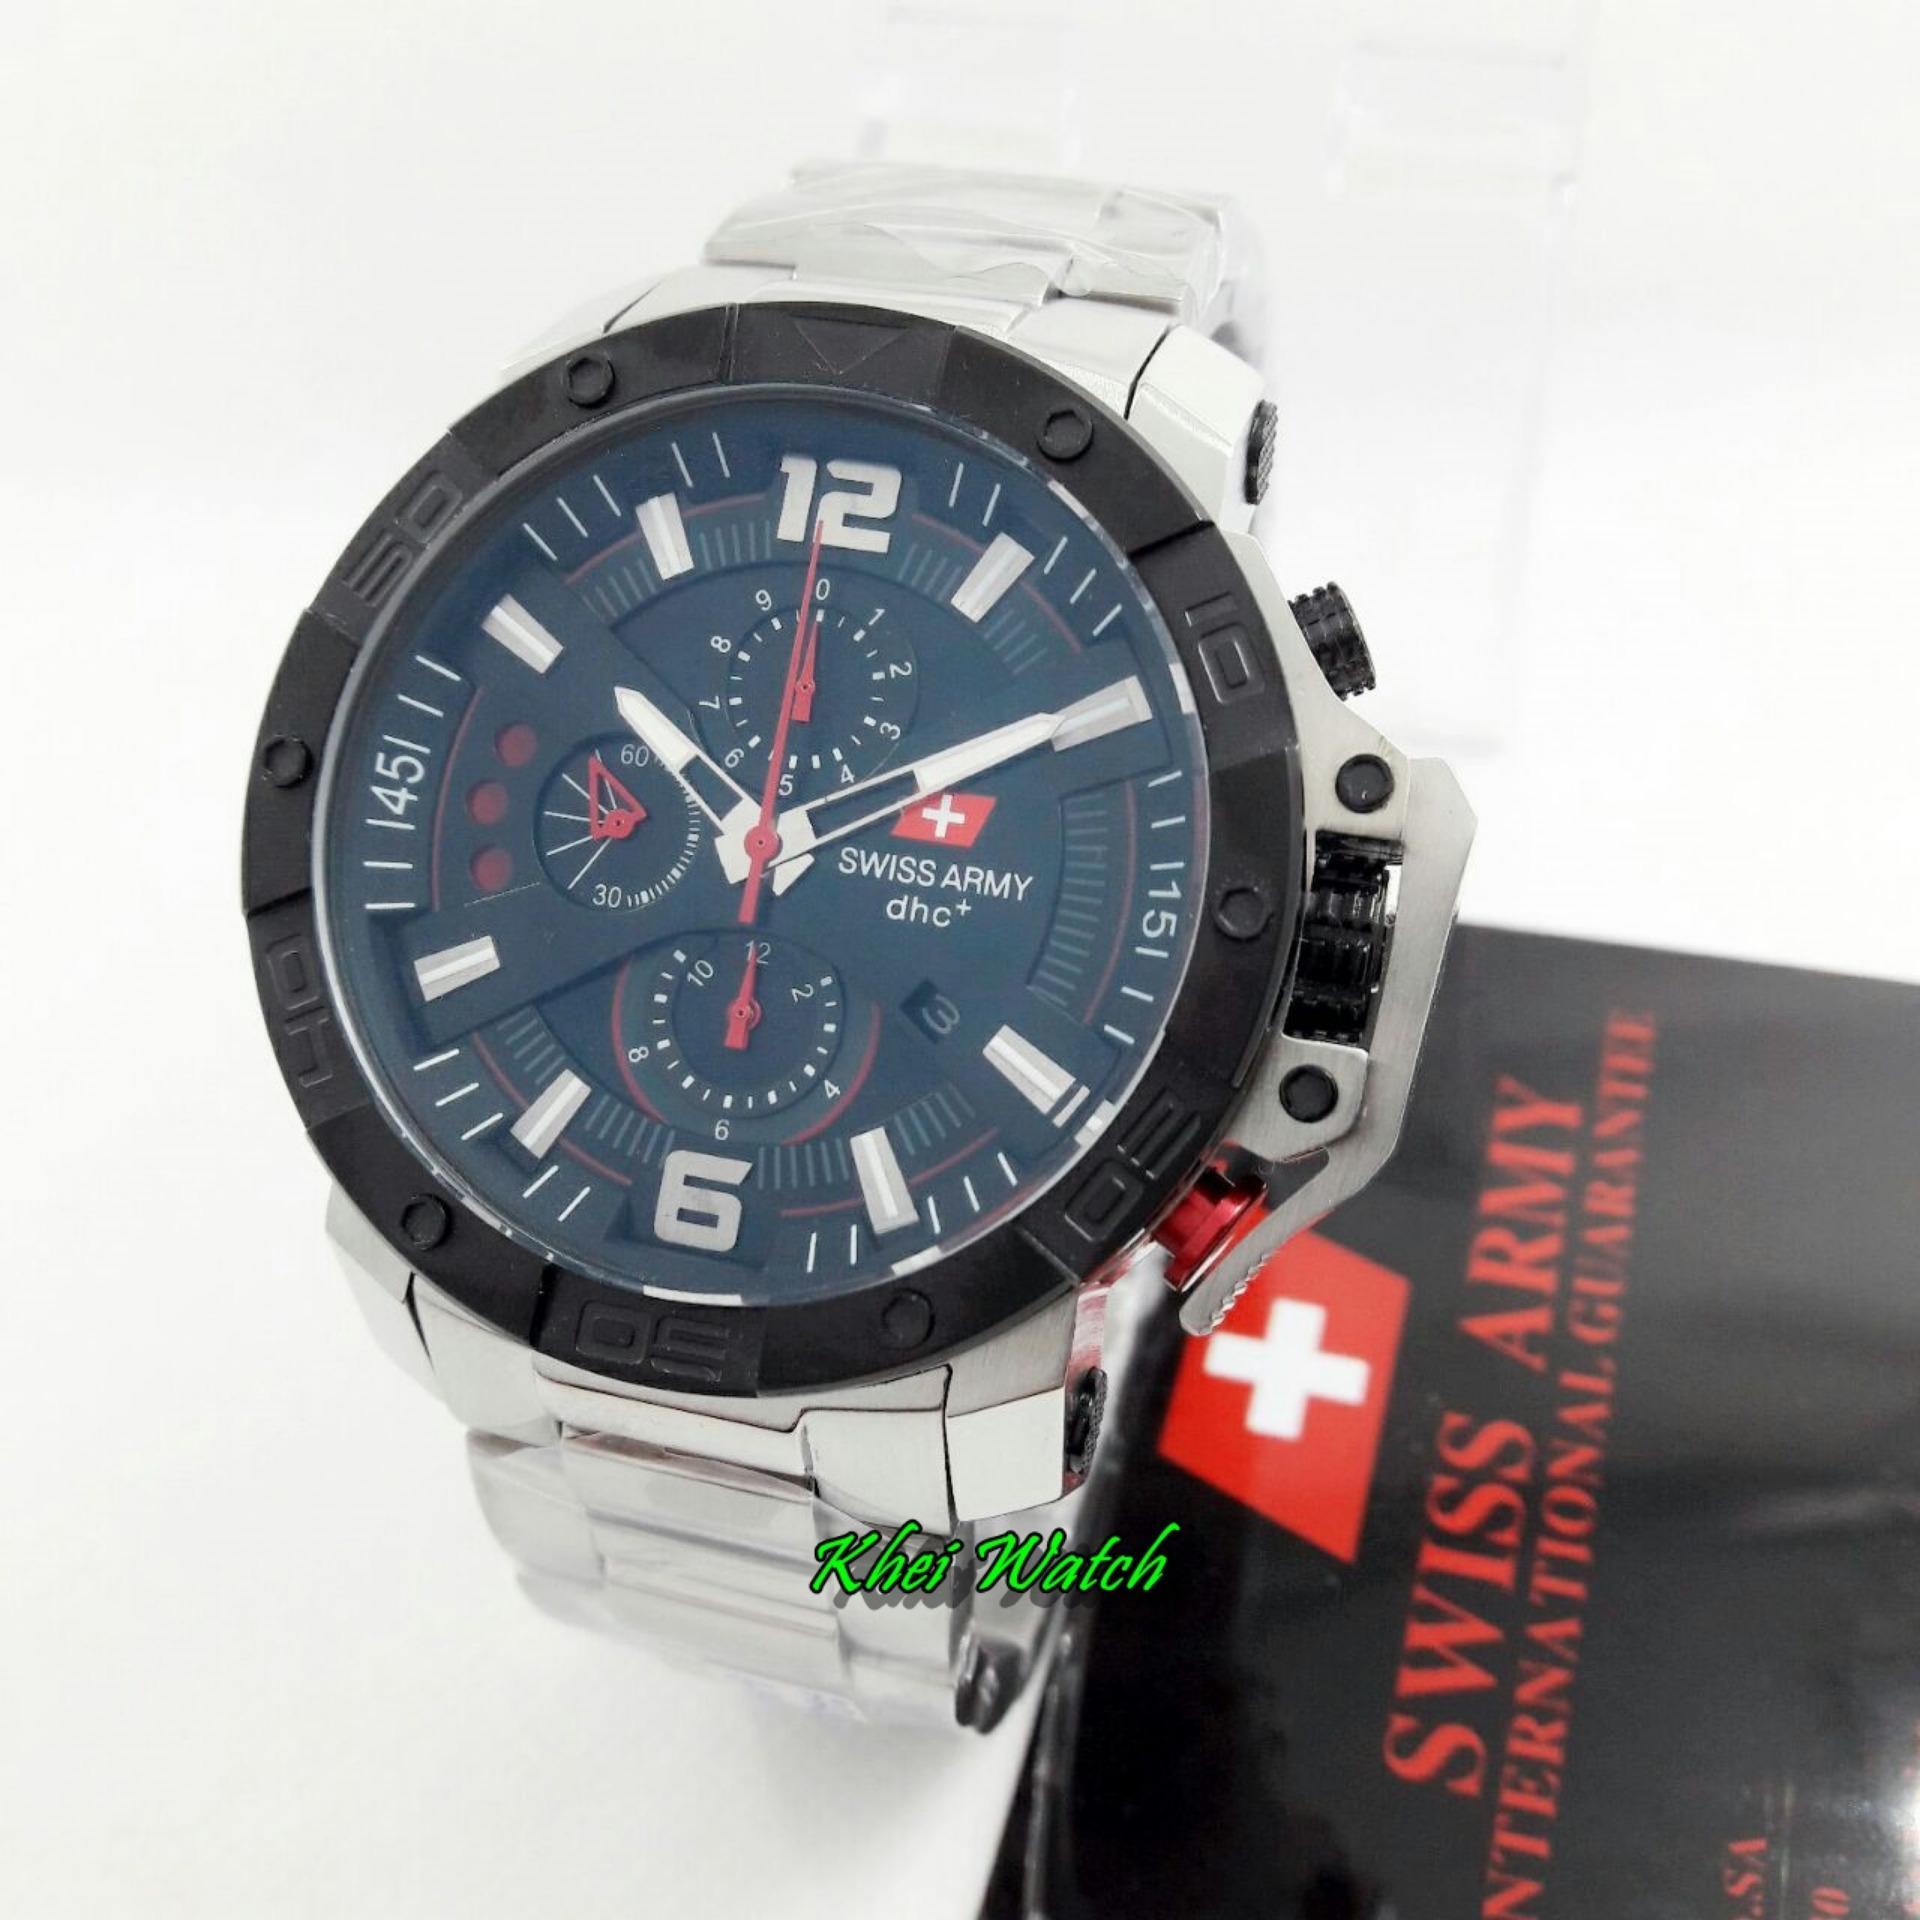 Harga Saya Swiss Army Sa2288 Chrono Jam Tangan Pria Original Flash Sale Stainlessteel Strap